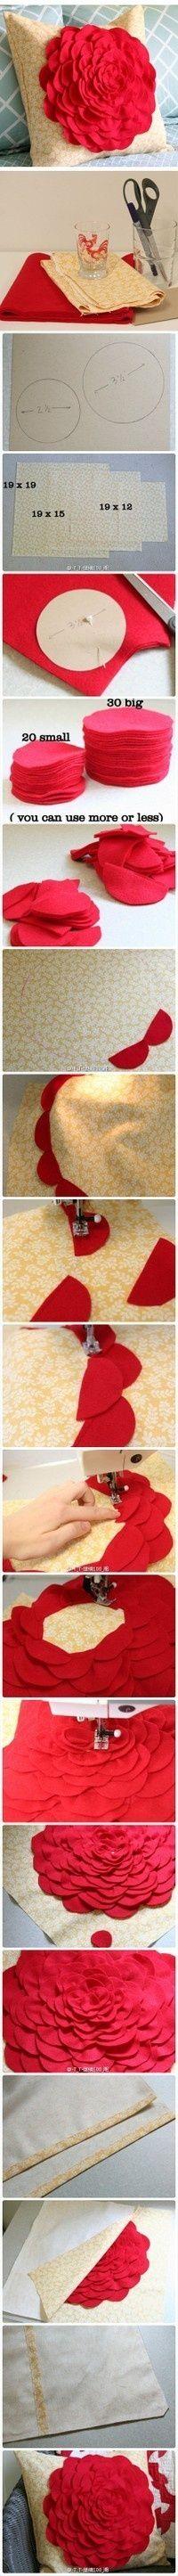 sewing machines, craft, living rooms, fabric flowers, pillow covers, throw pillows, flower tutorial, felt flowers, diy pillows